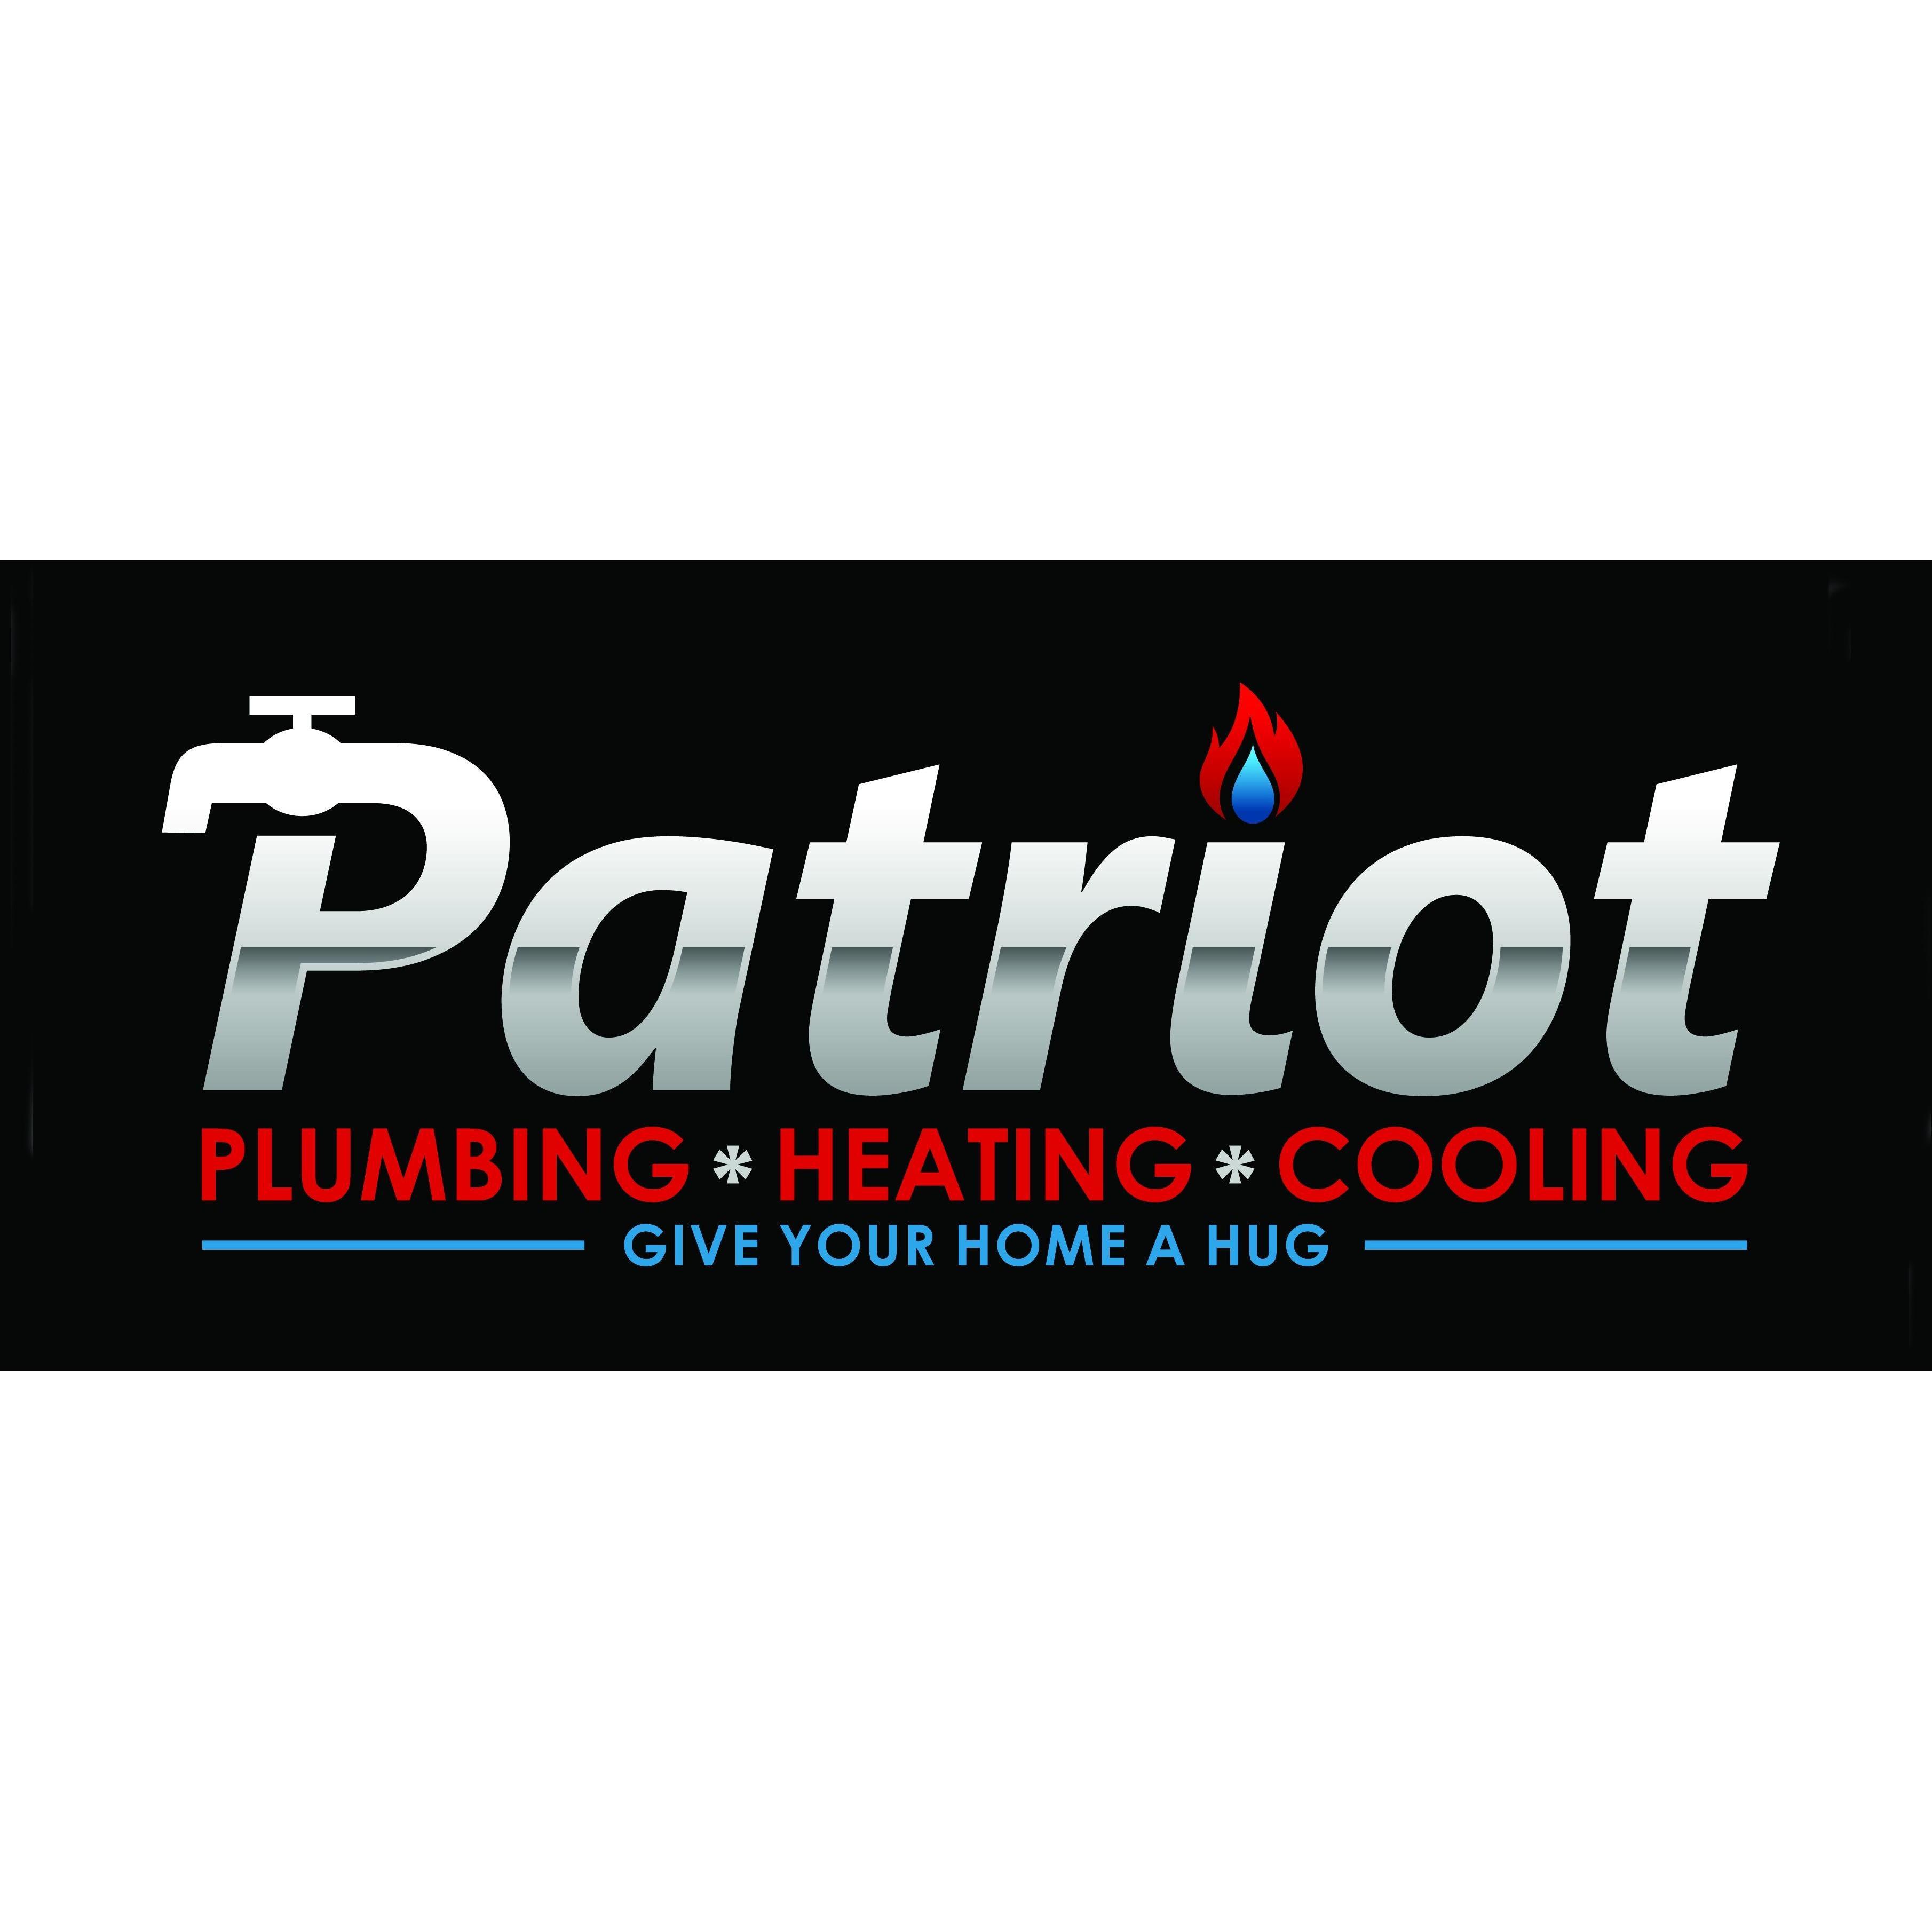 Patriot Plumbing, Heating & Cooling Inc - Wenatchee, WA - Plumbers & Sewer Repair